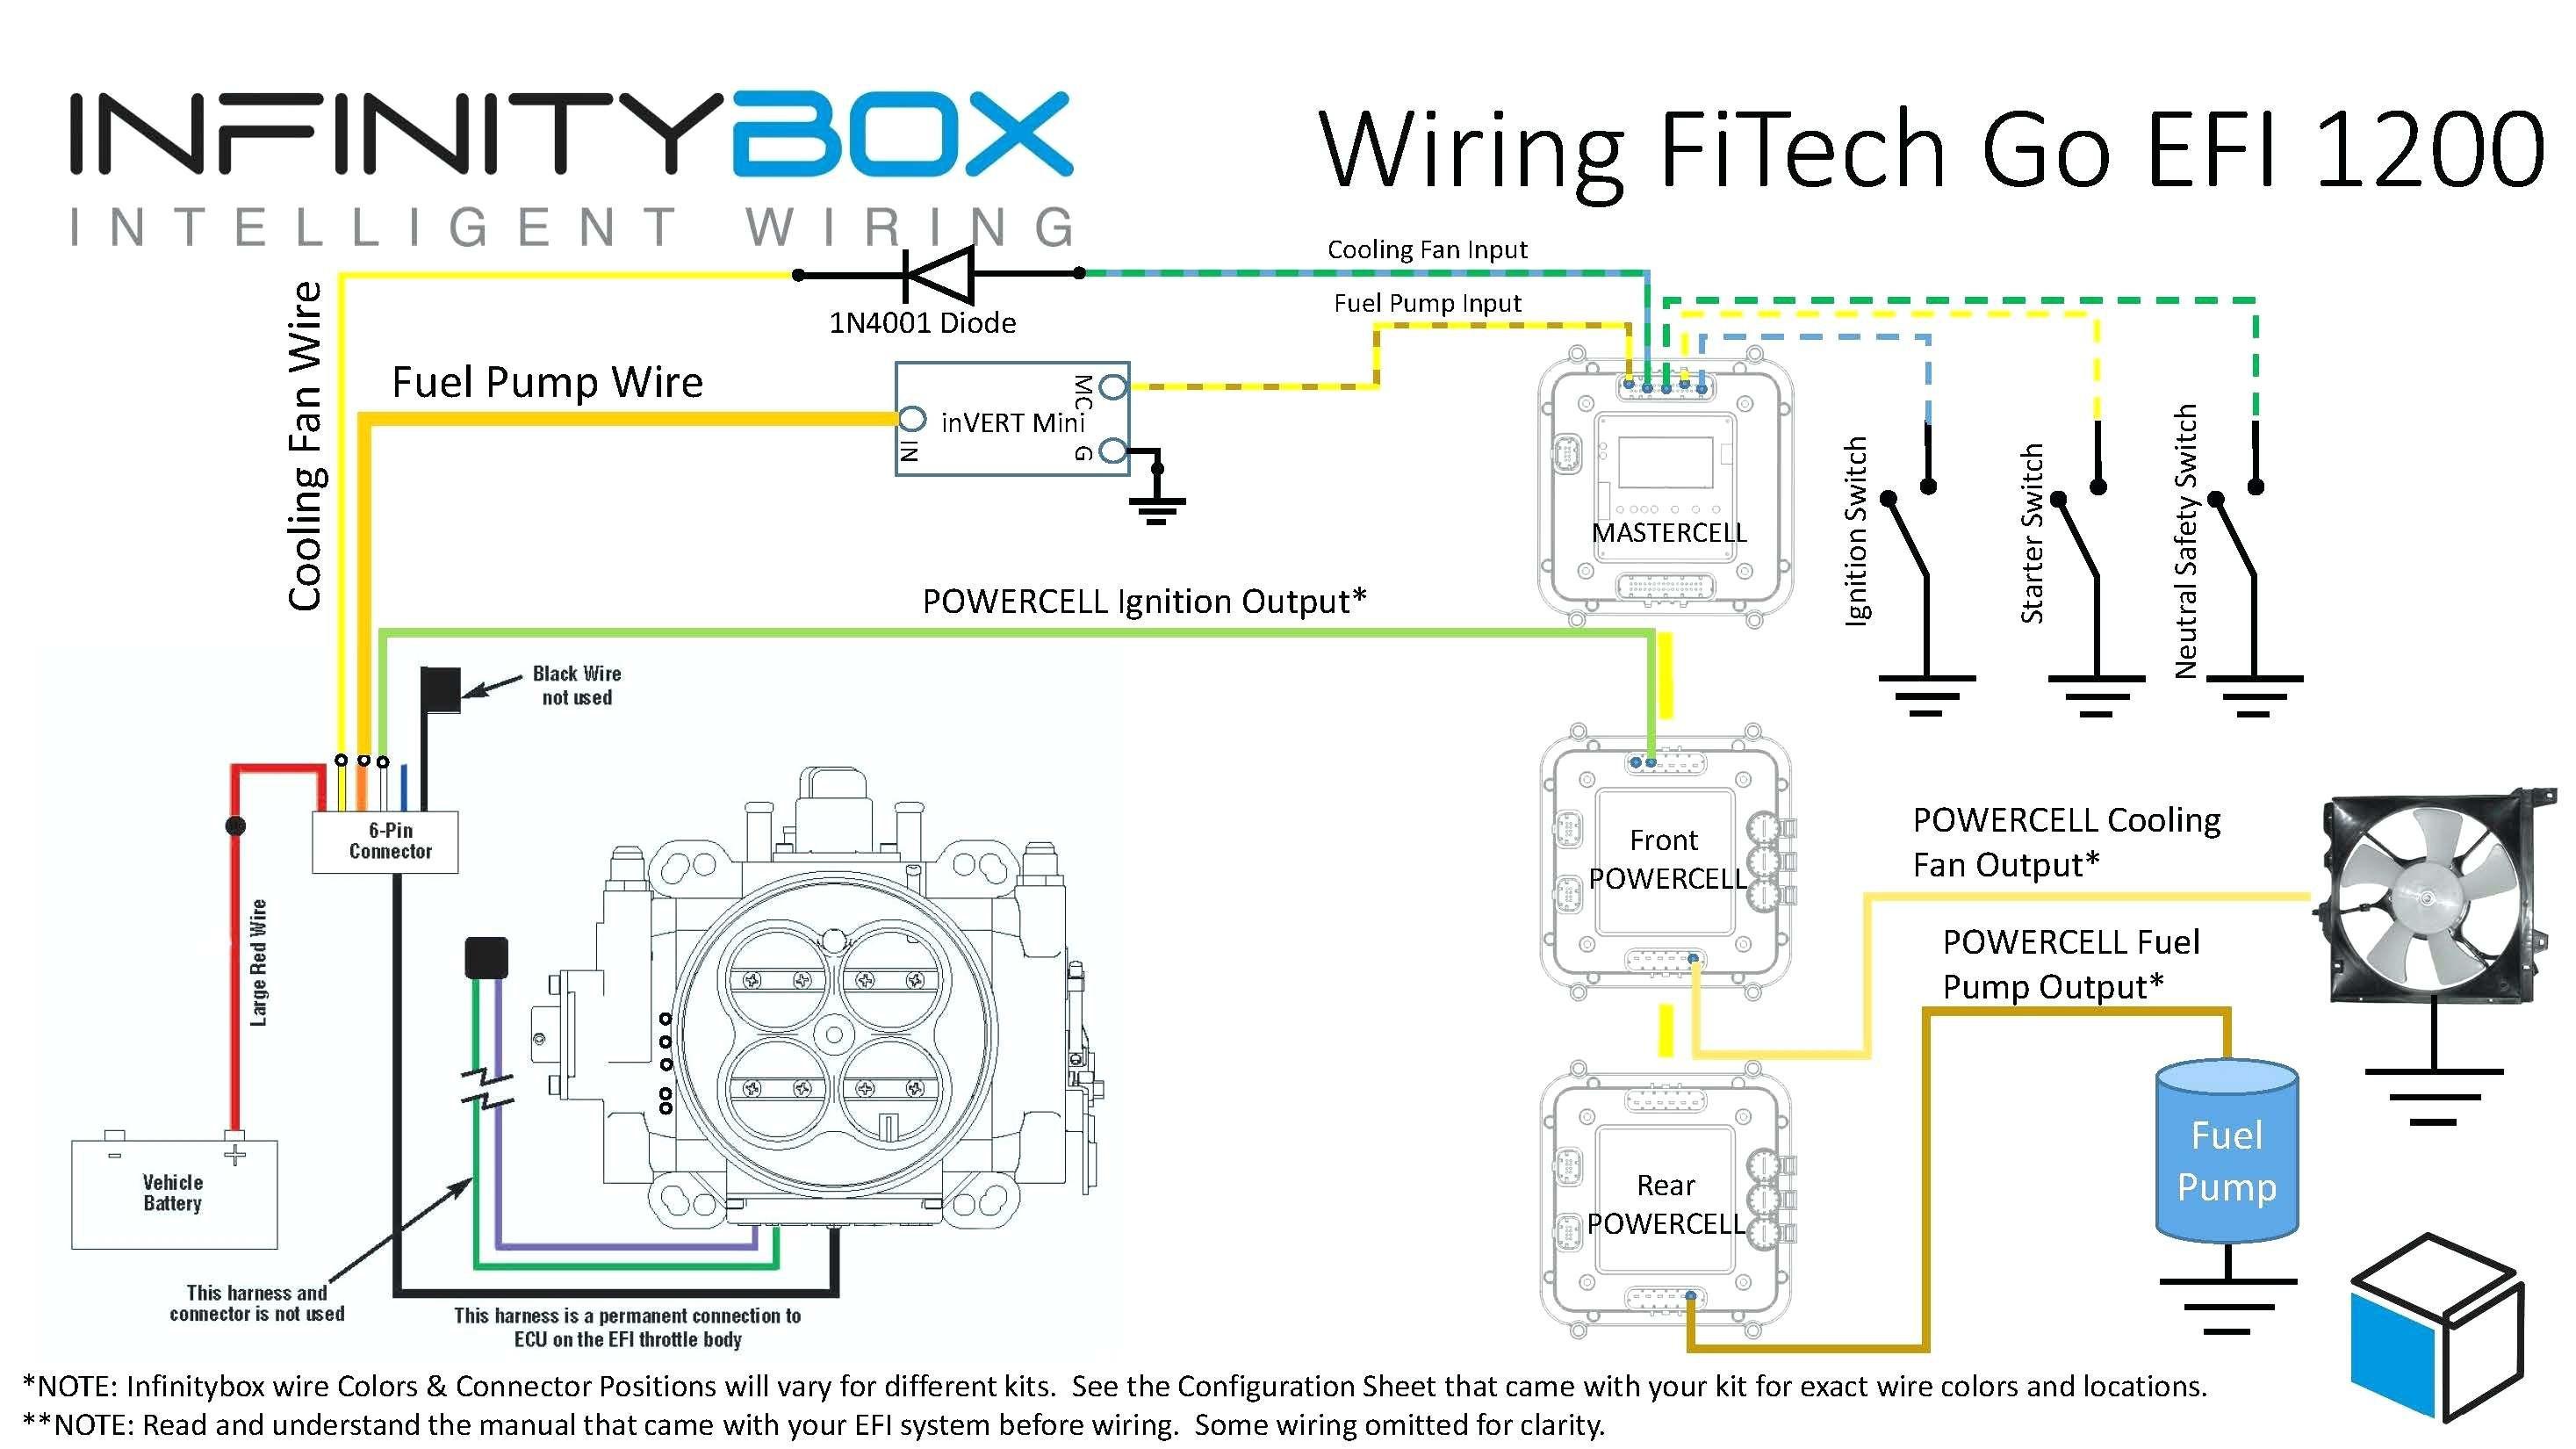 4 Prong Twist Lock Plug Wiring Diagram Luxury Vintage Air Lovely - 4 Prong Twist Lock Plug Wiring Diagram